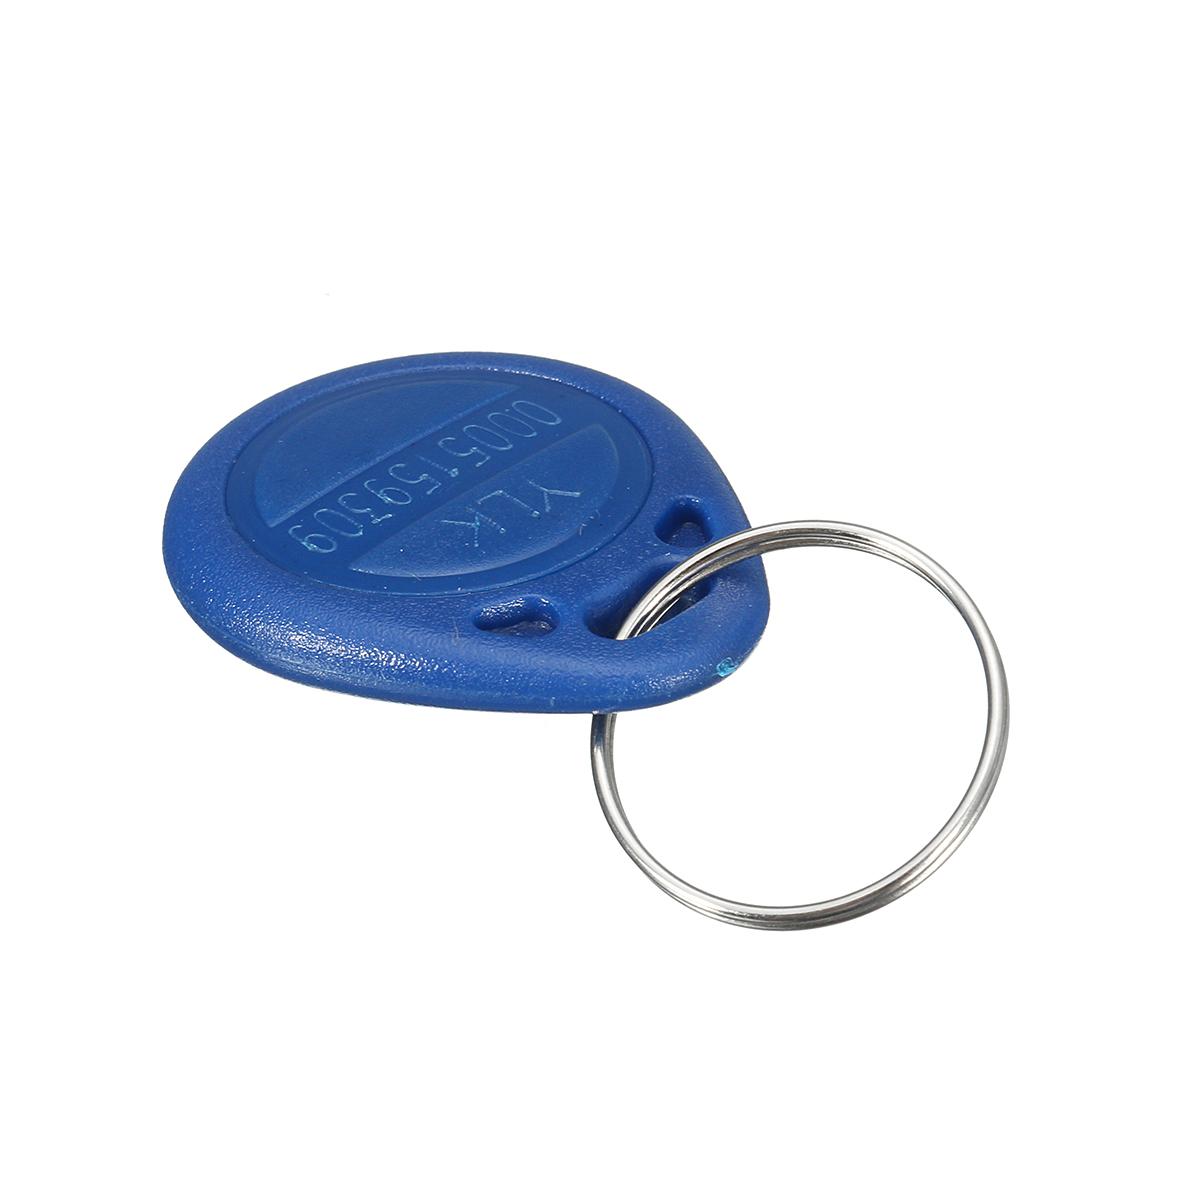 5Pcs ID Keyfbobs RFID Tag Key Ring Card 125KHZ Proximity Token Access Control Attendance TK4100